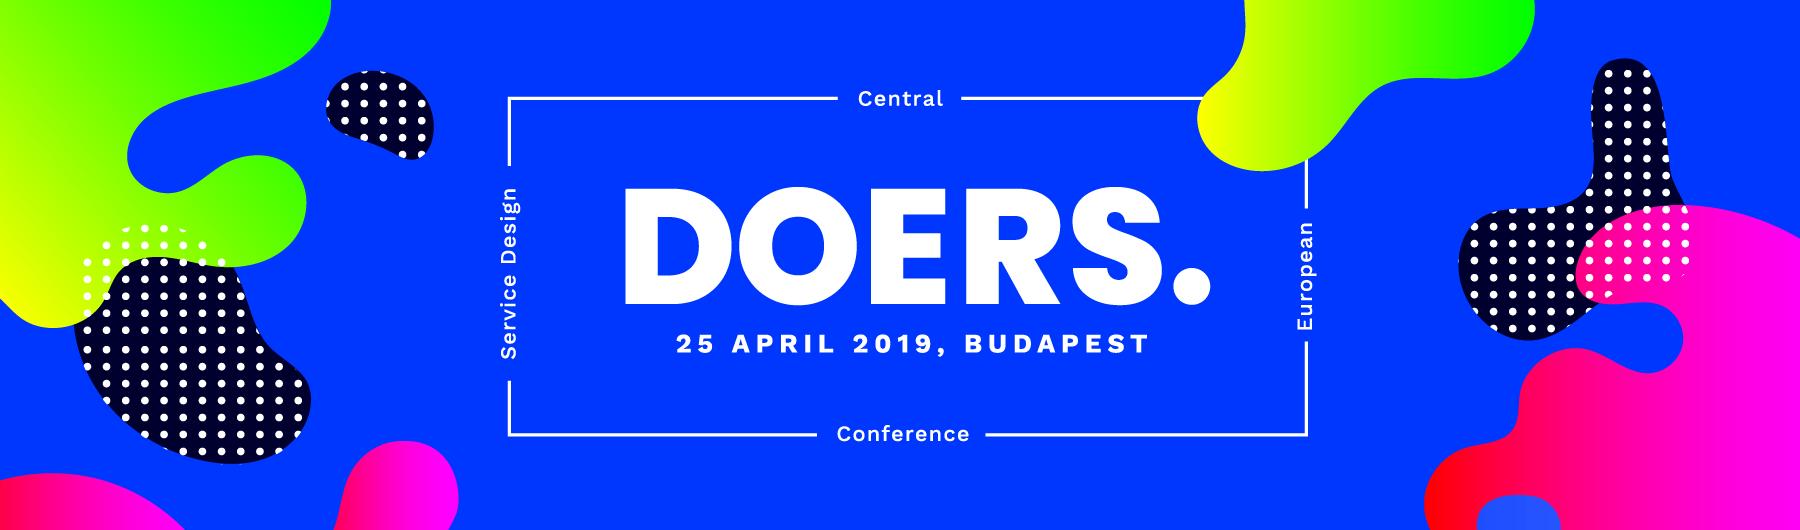 DOERS 2019 - Central European Service Design Conference